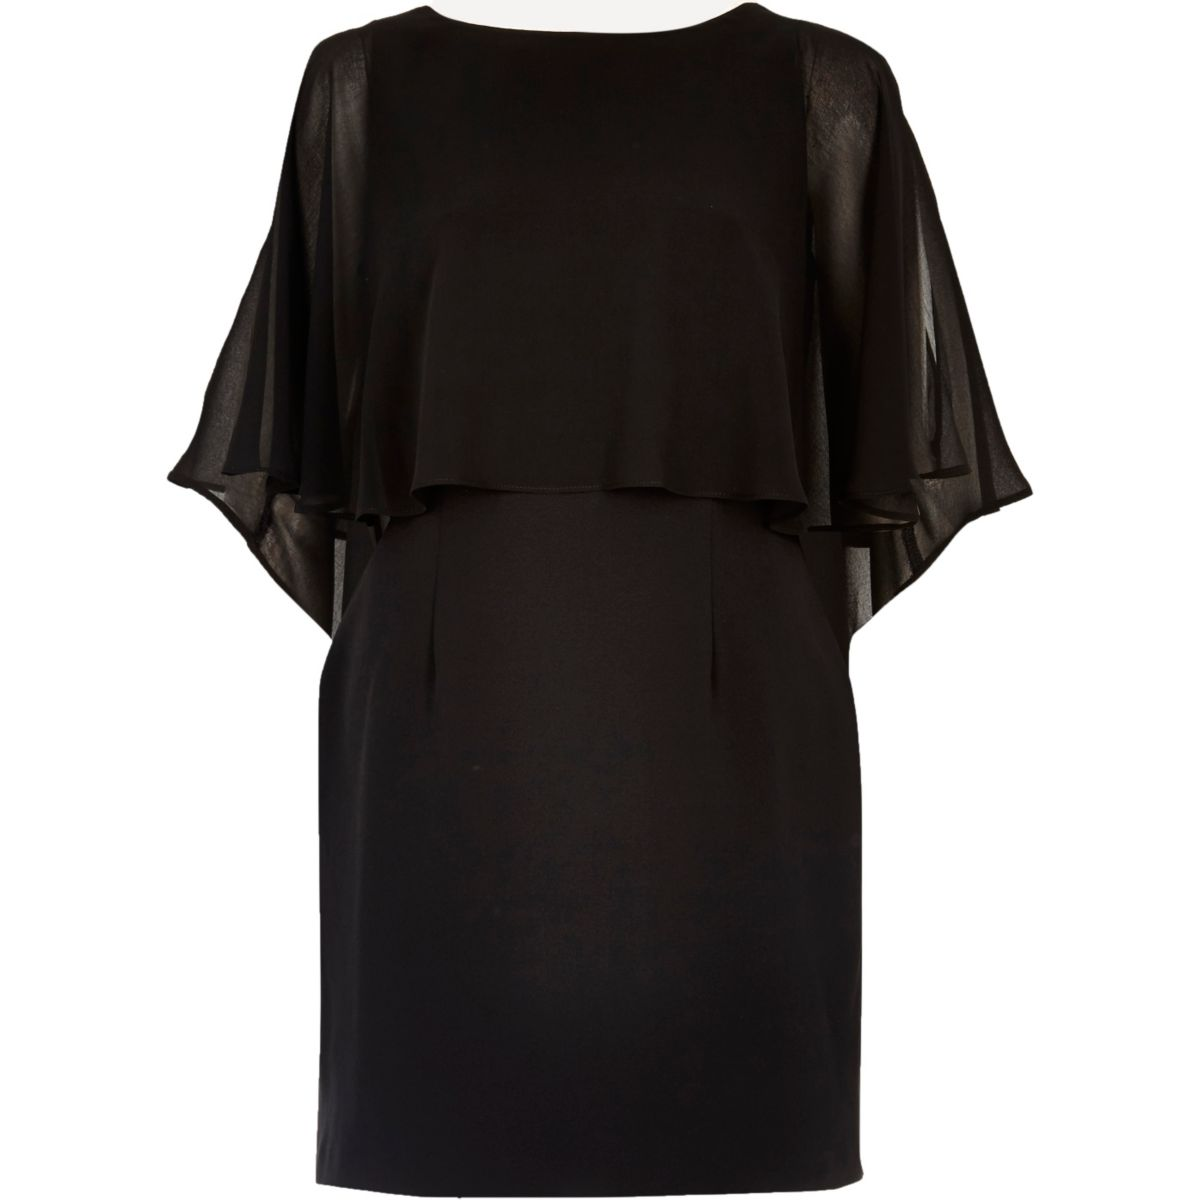 Schwarzes Minikleid mit Chiffonumhang